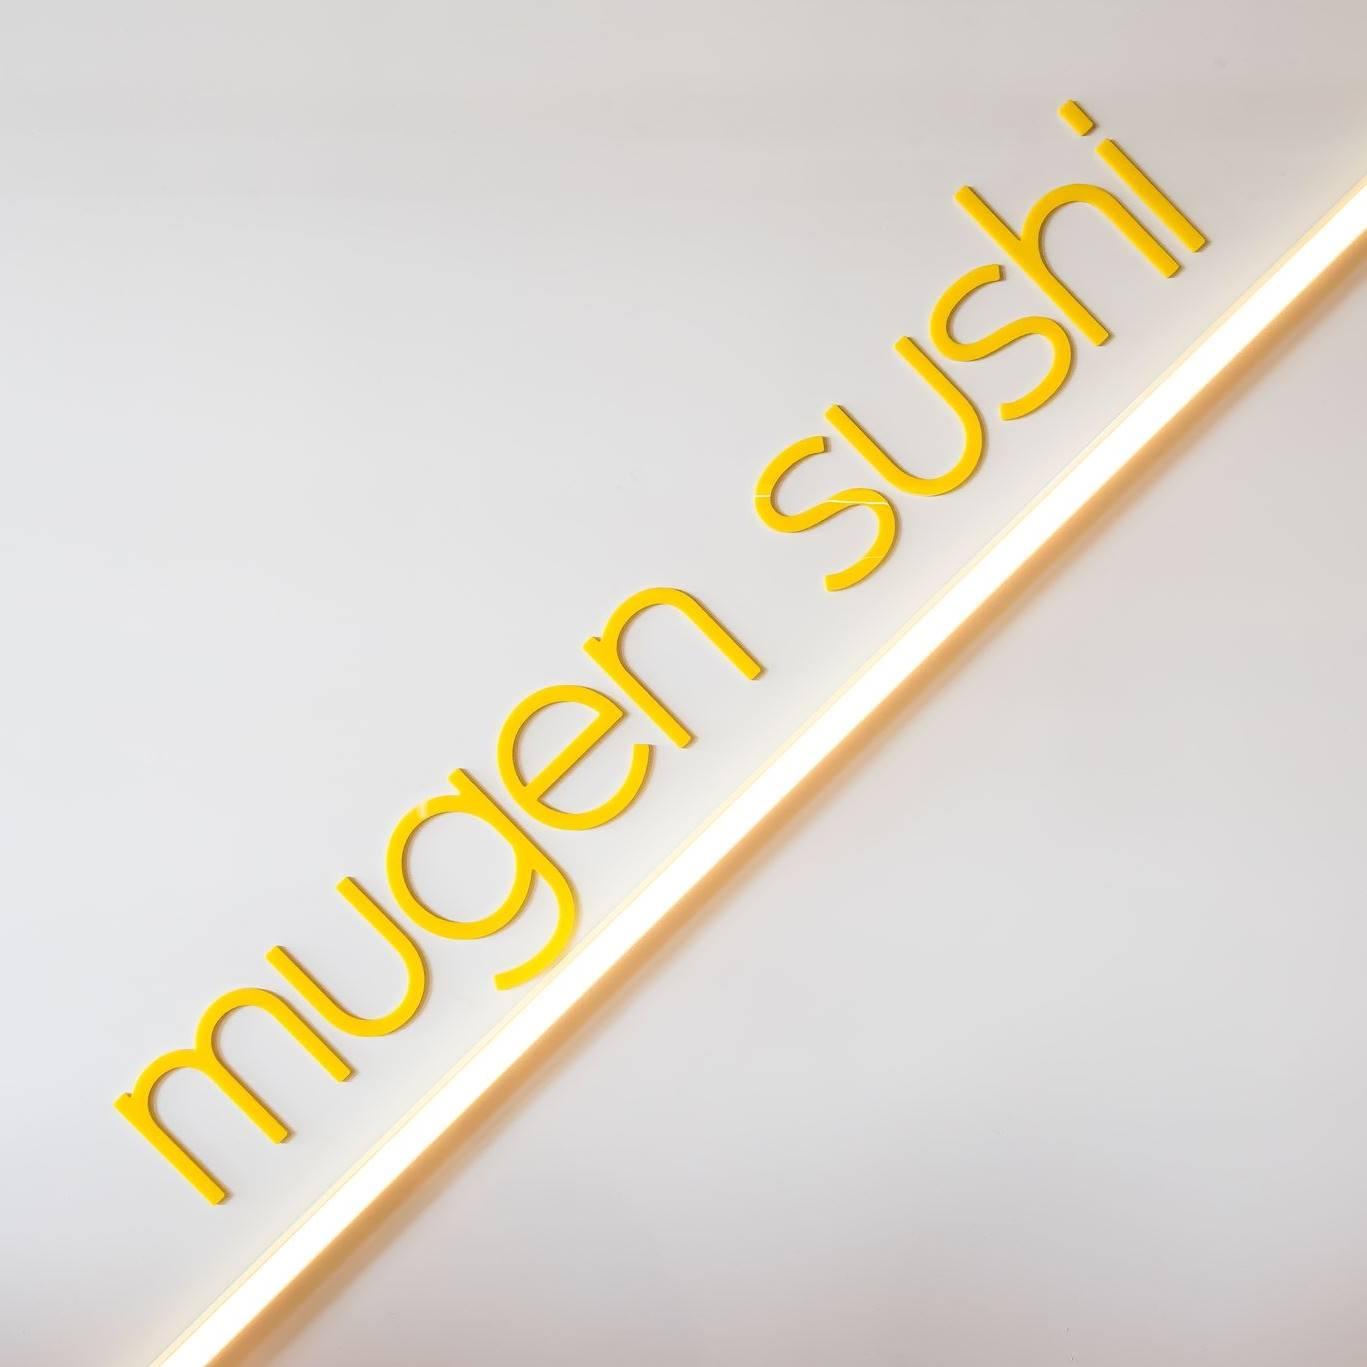 Mugen Sushi Train logo